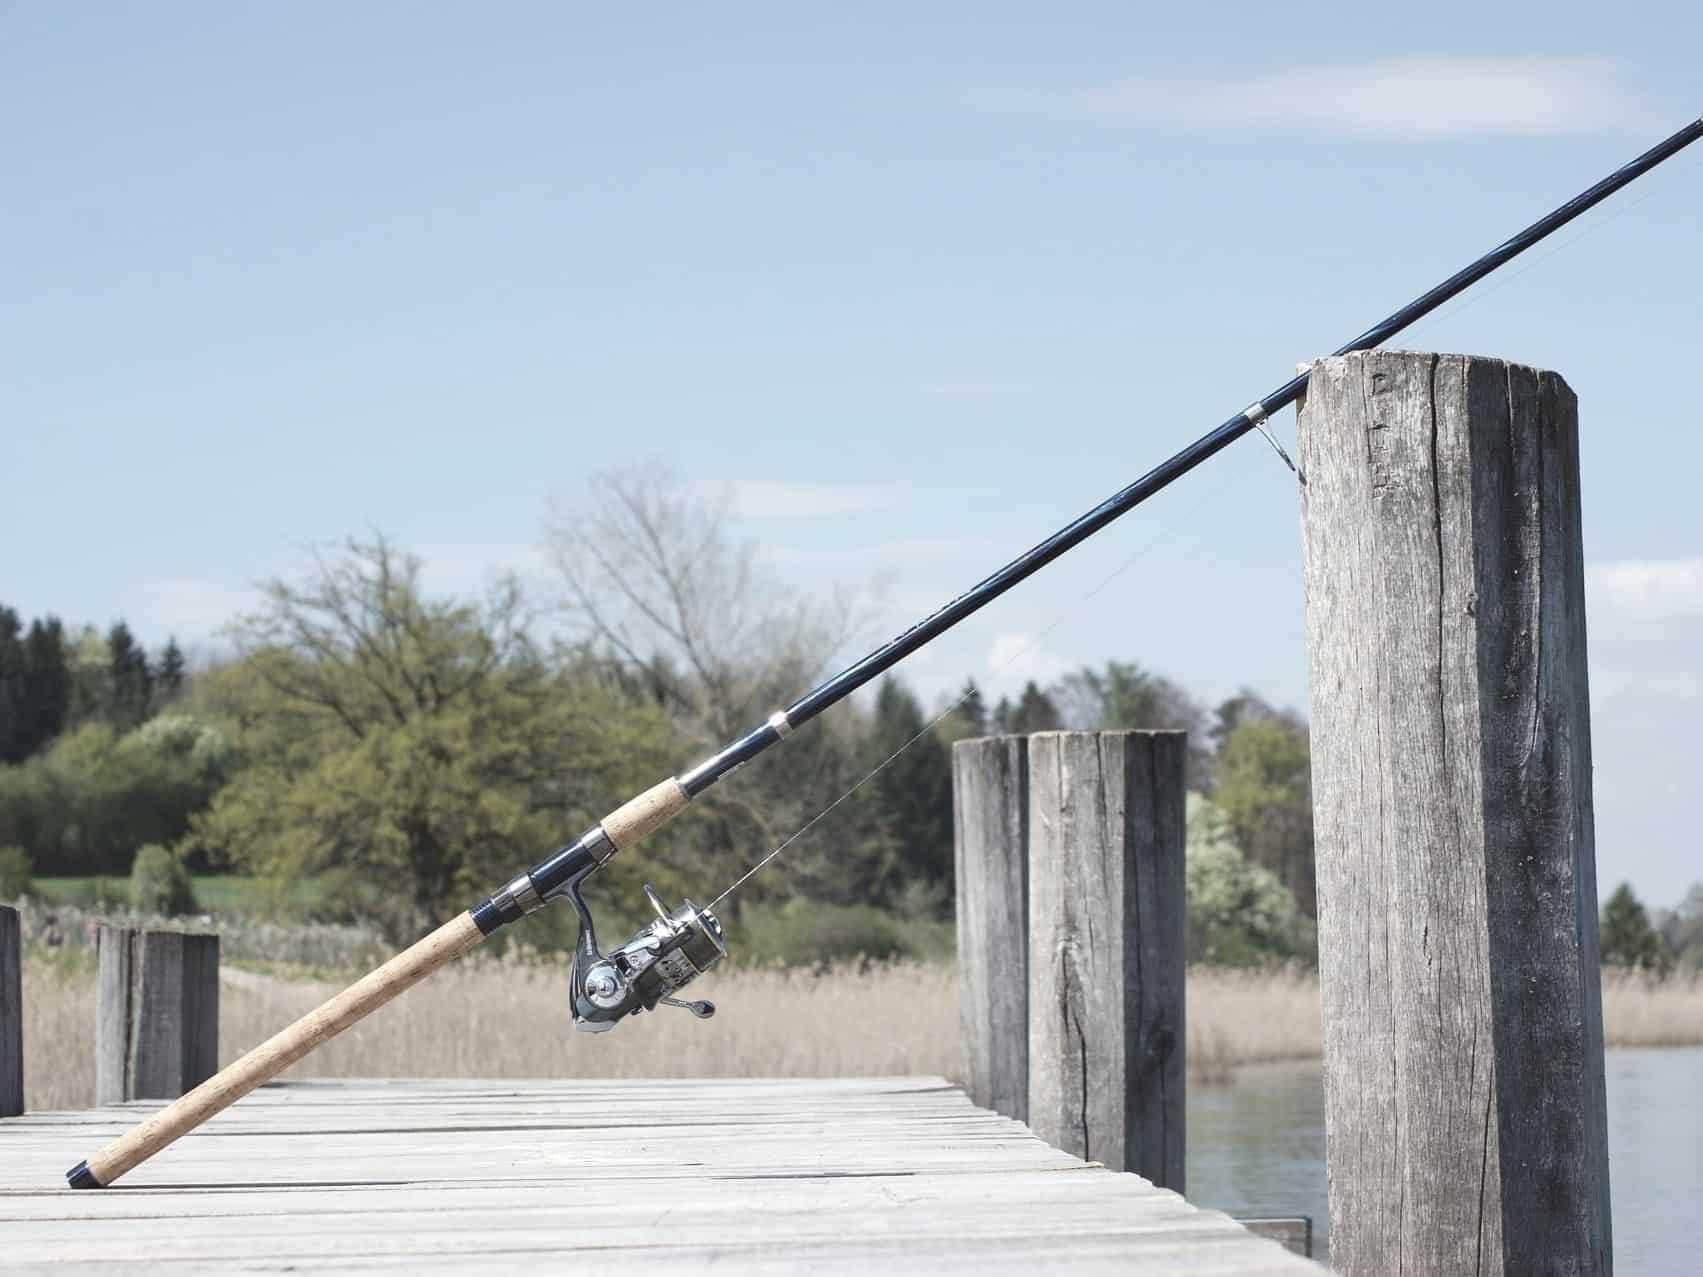 Rods - Orbit Fishing